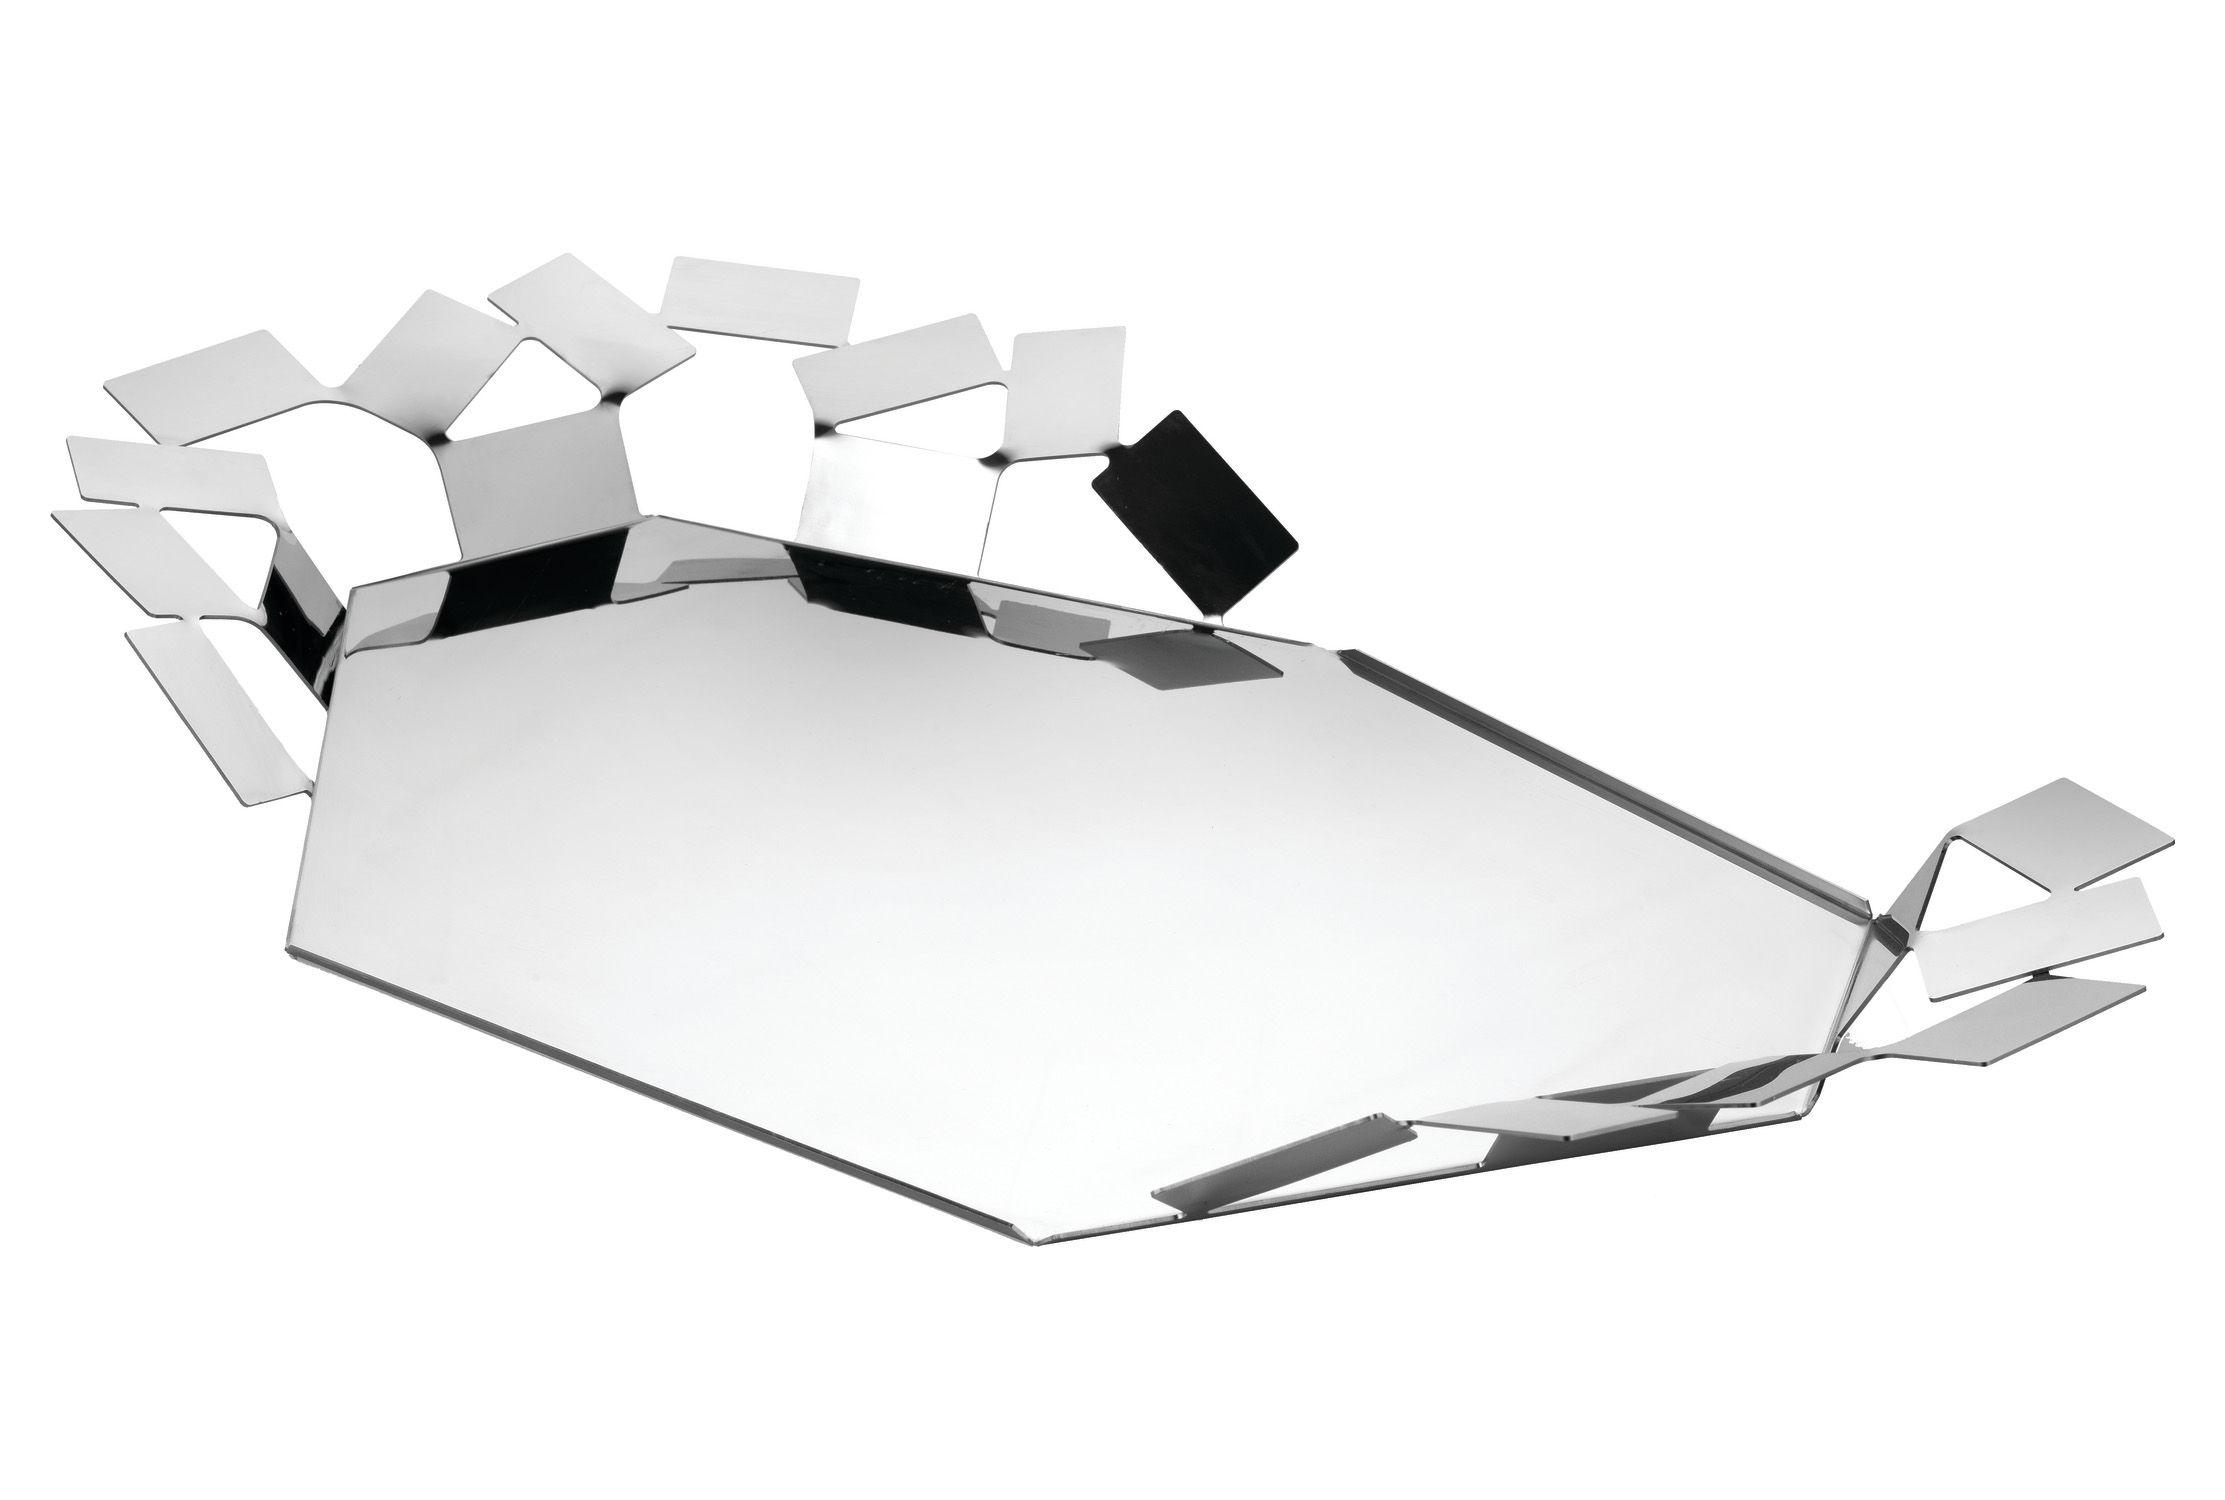 Tischkultur - Tabletts - La Stanza dello Scirocco Tablett - Alessi - Edelstahl glänzend - polierter rostfreier Stahl